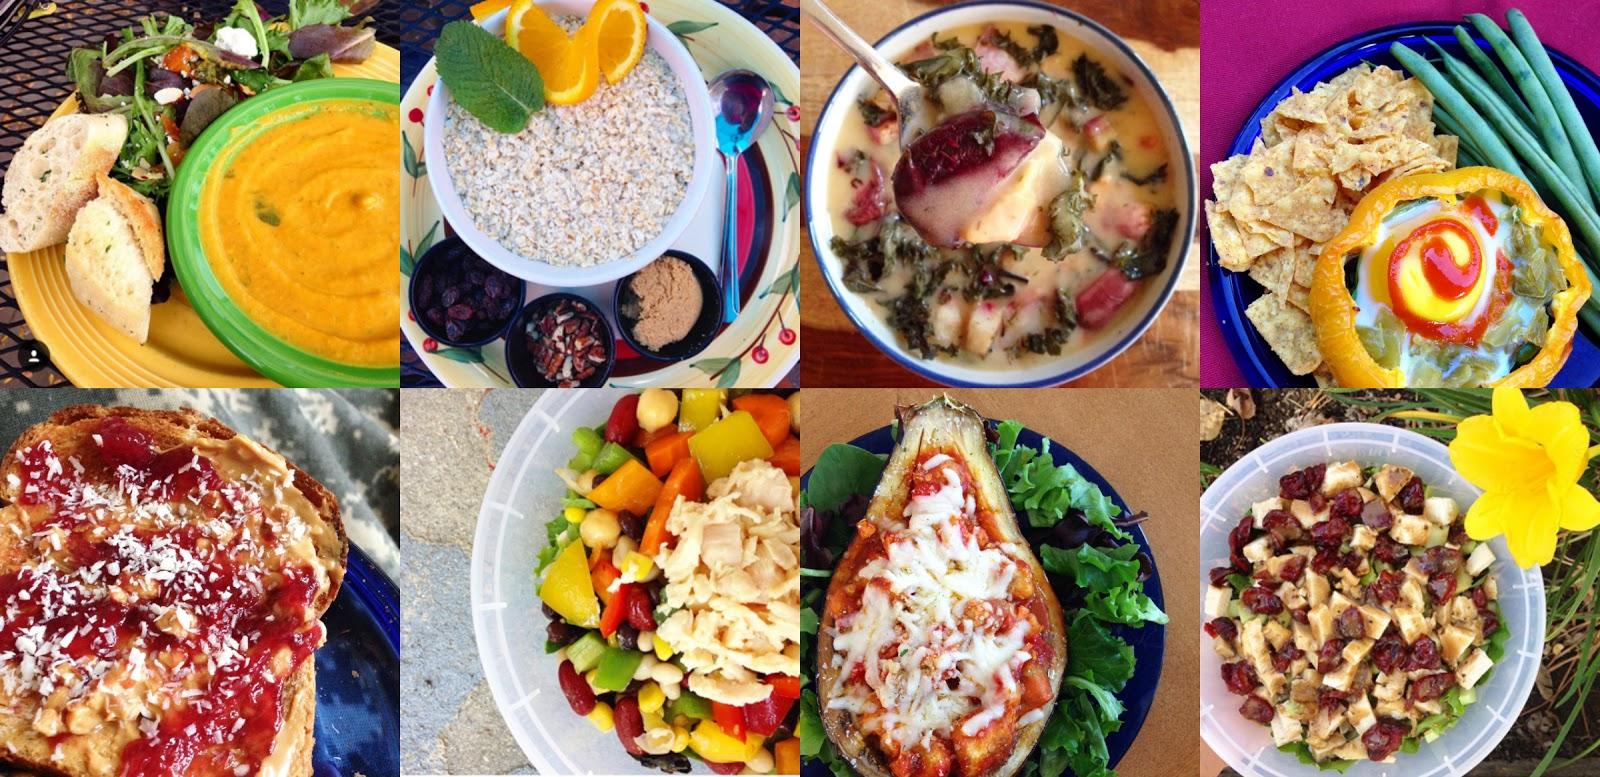 IIFYM, Macronutrient Tracking, IIFYM for Runners, Balanced Eating